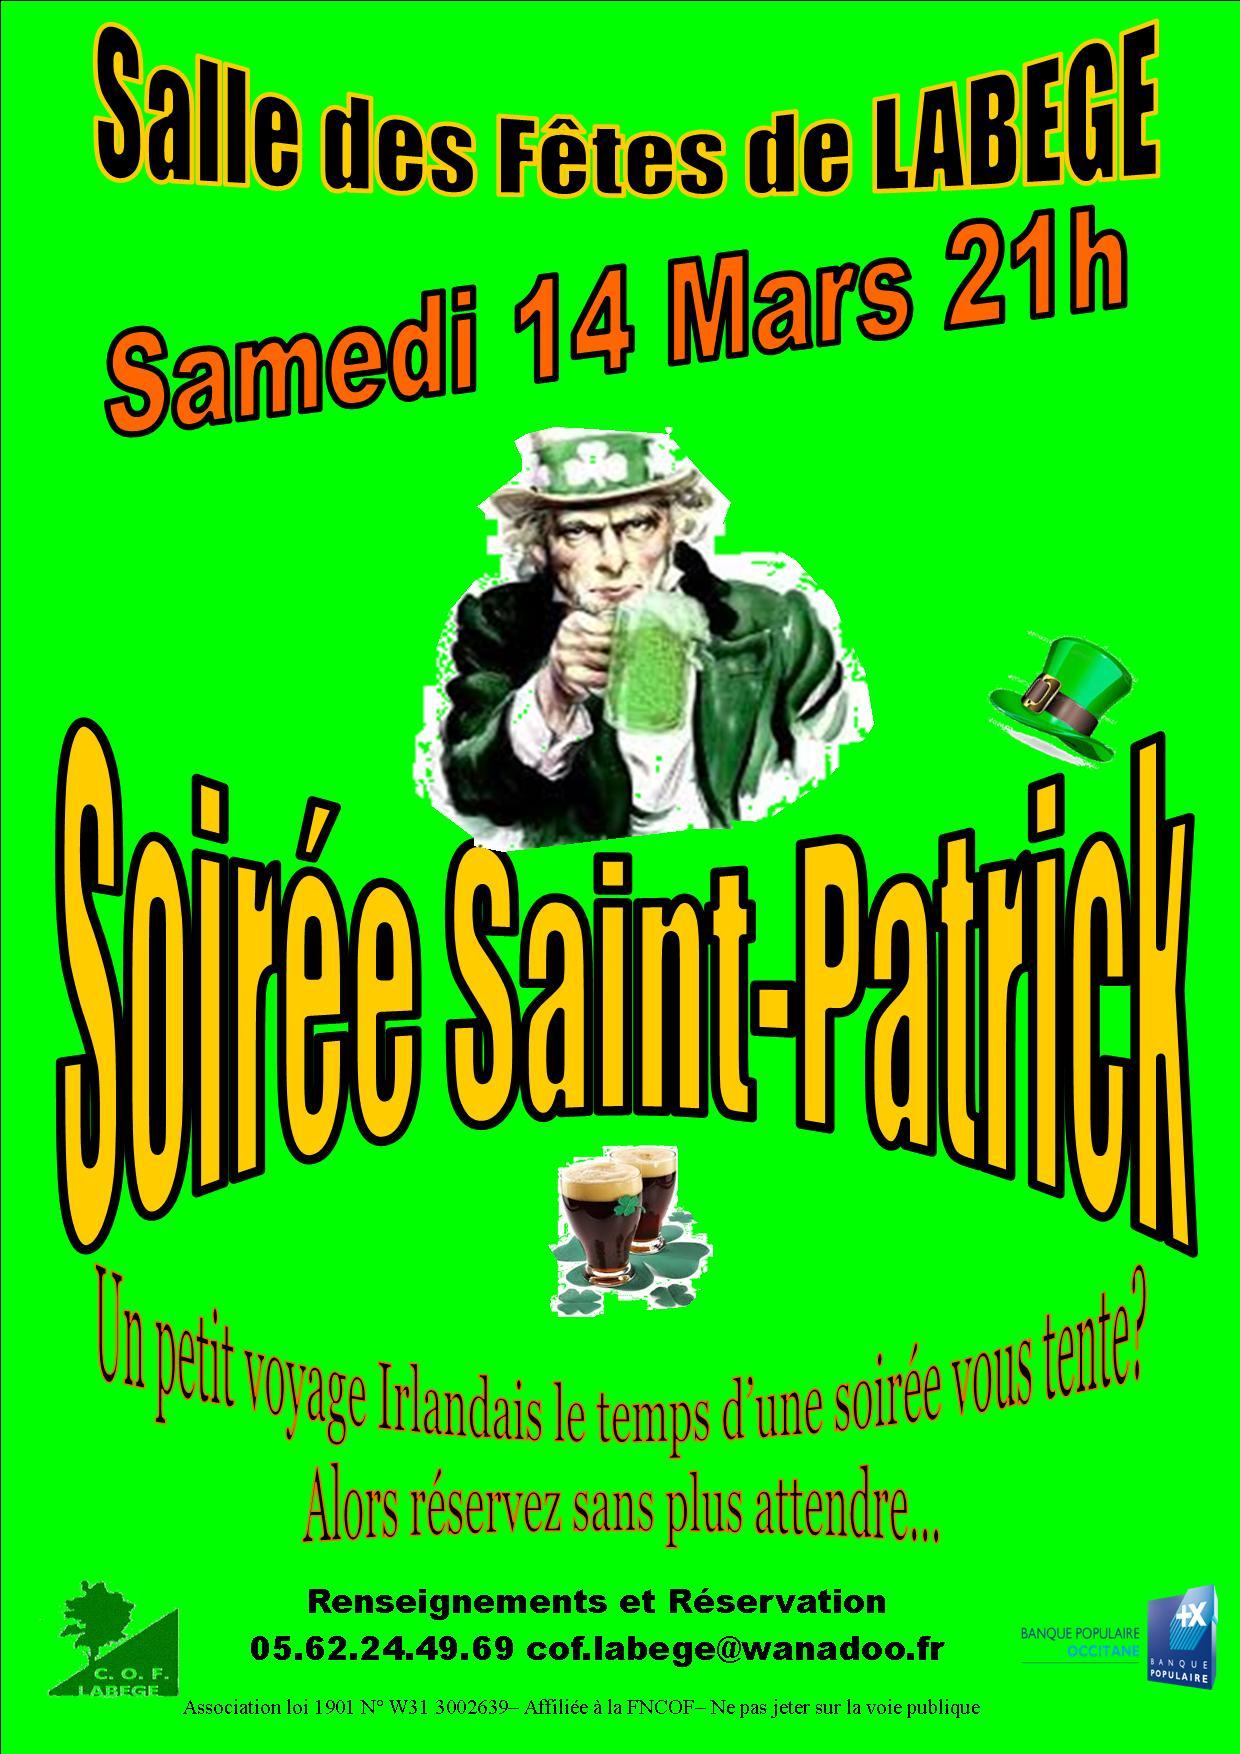 Soire Saint Patrick Samedi 14 Mars 2015 20h La Salle